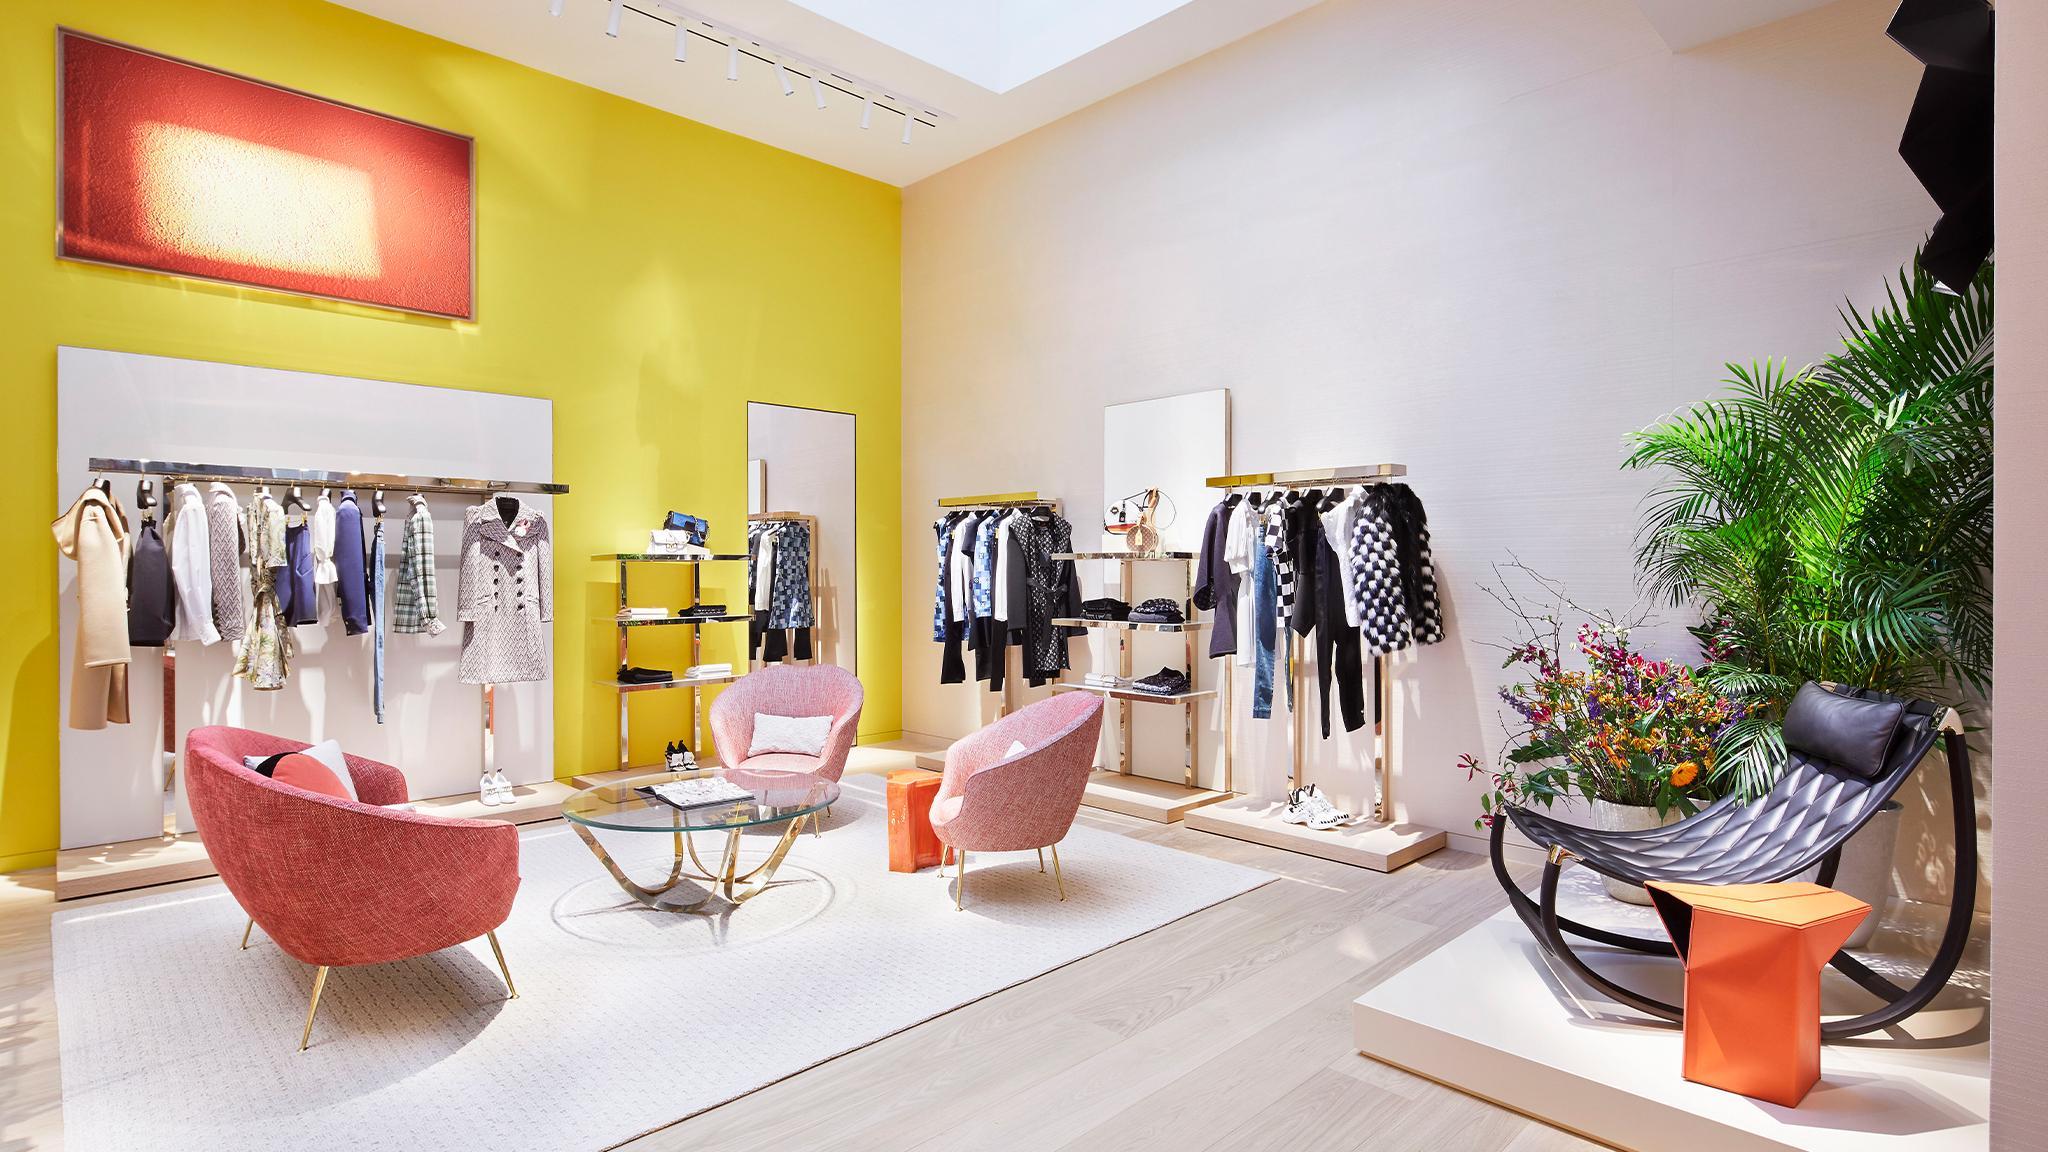 Louis Vuitton's Stunning Store Front by UNStudio